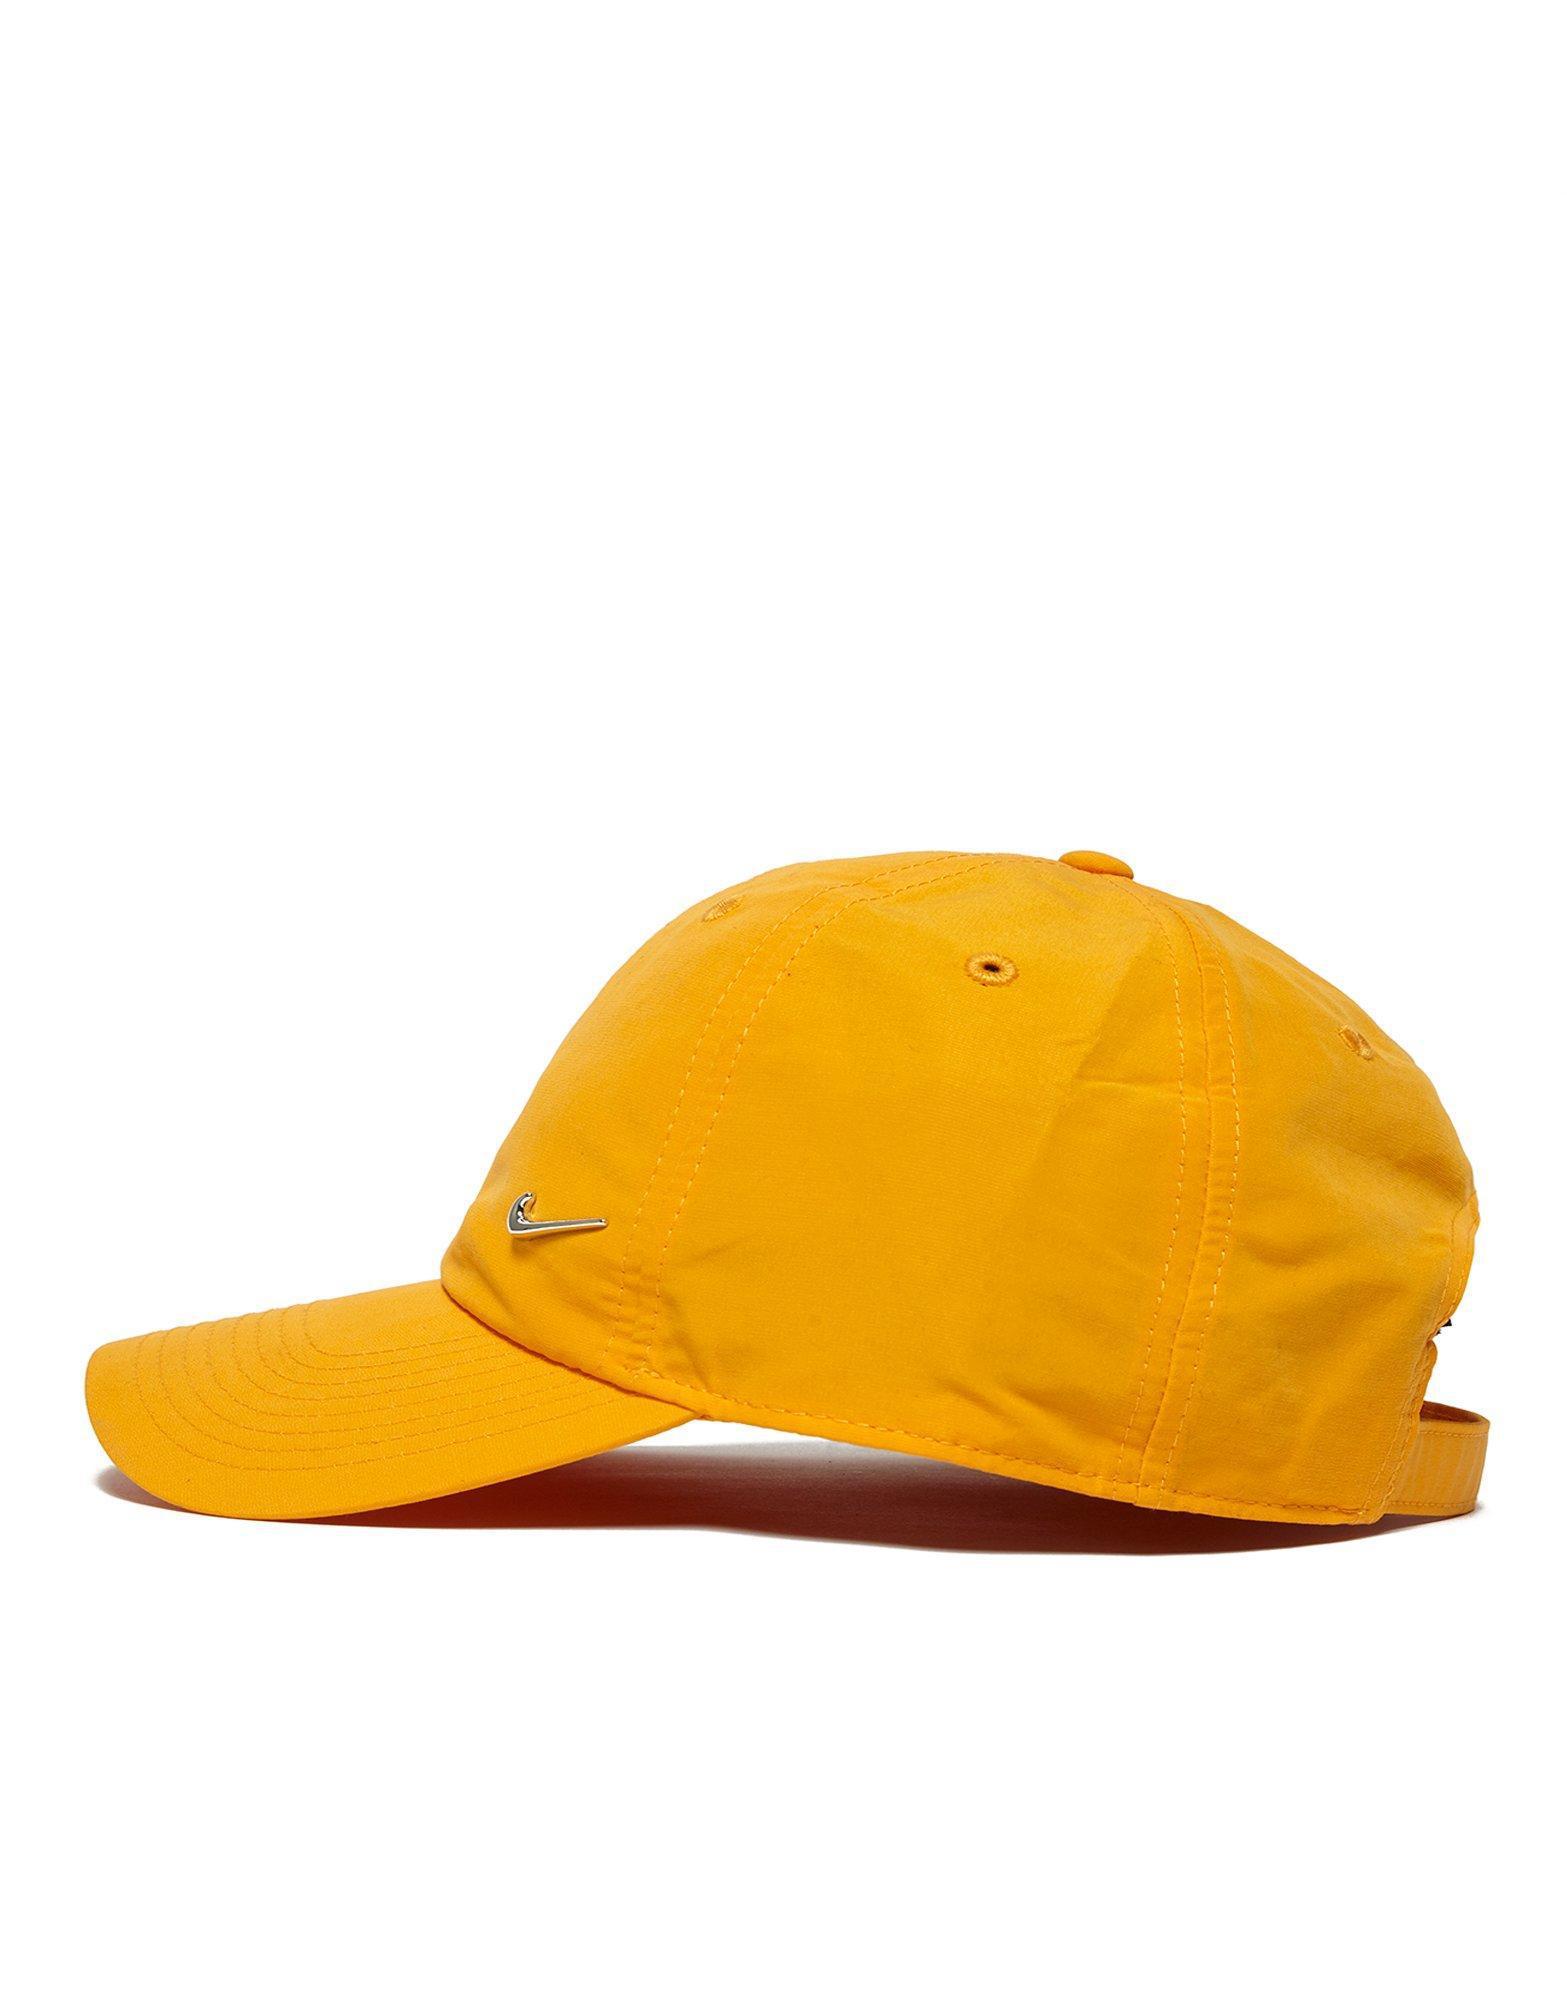 79455572 Nike Metal Swoosh Cap In Orange 340225-804 in Orange for Men - Lyst